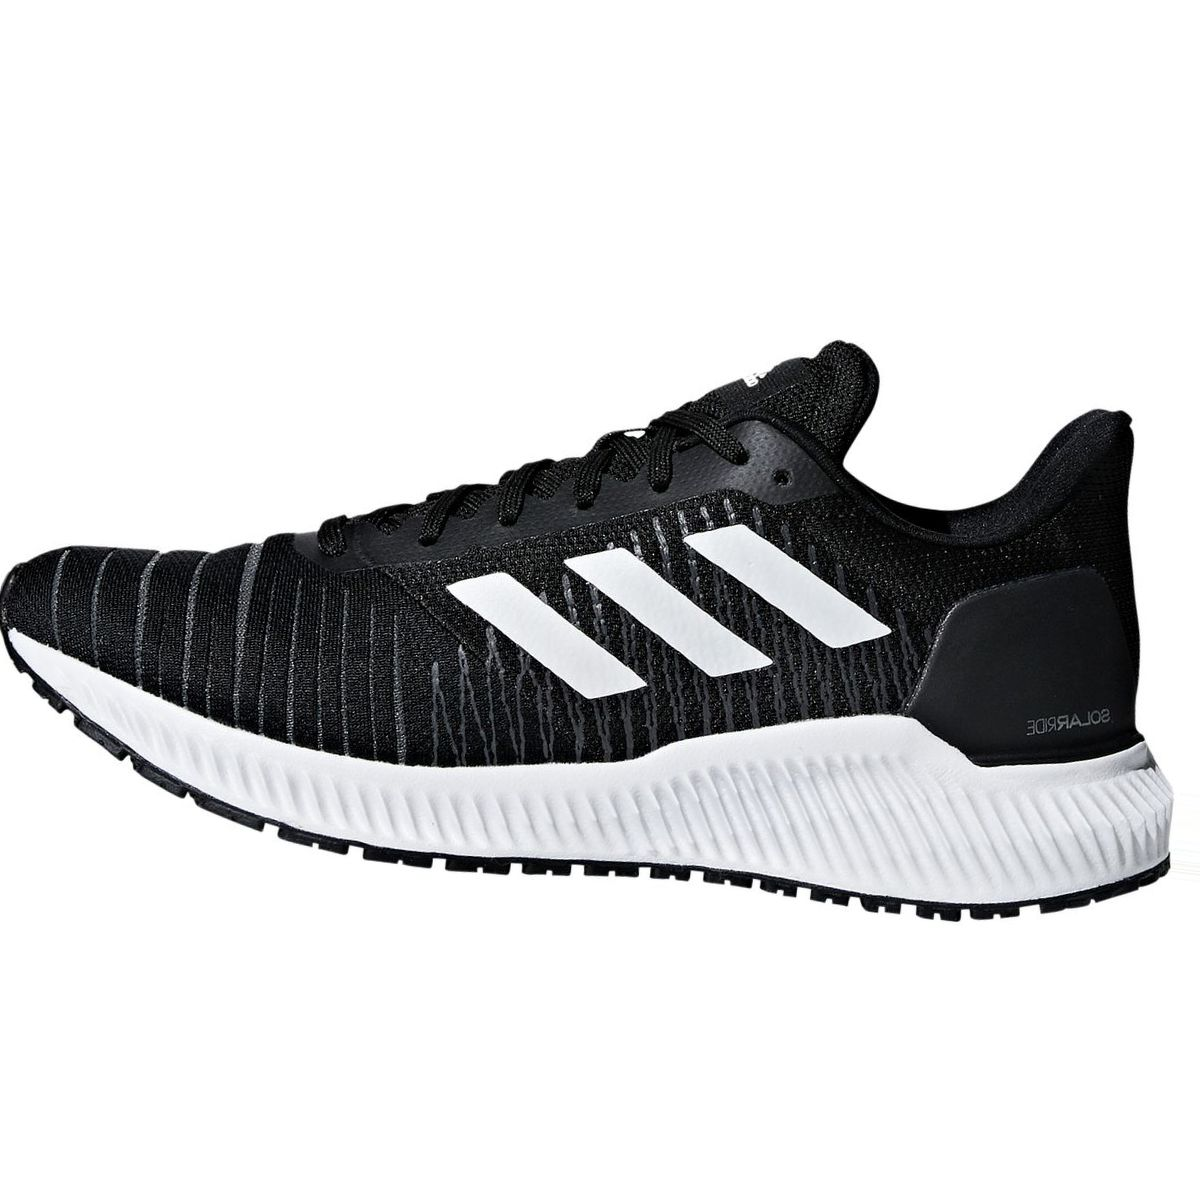 Adidas Solar Ride Running Shoe - Women's